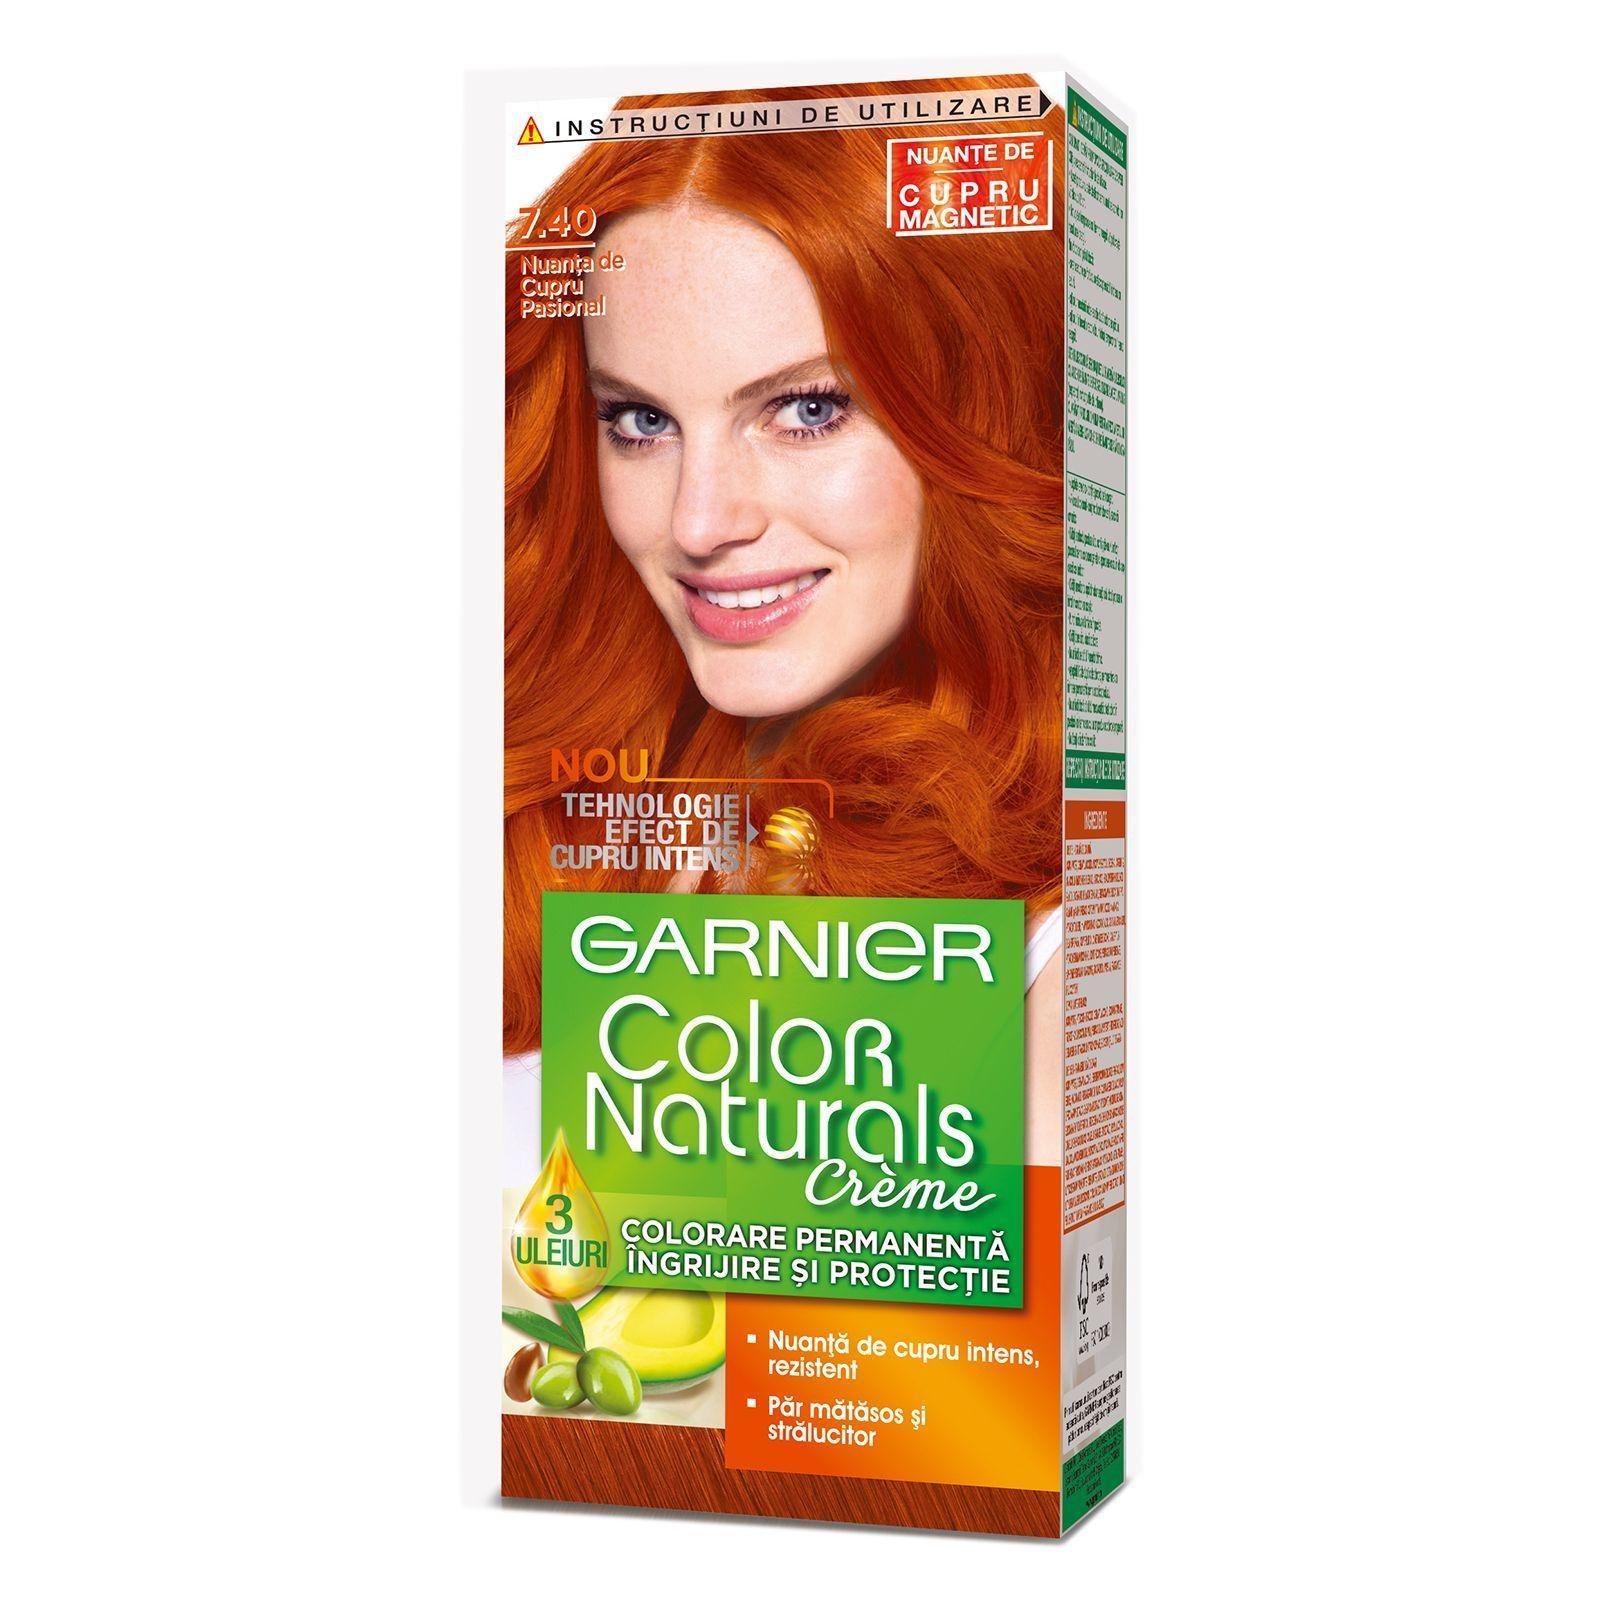 12 3 Garnier Color Naturals Creme 7 40 Passionate Copper Hair